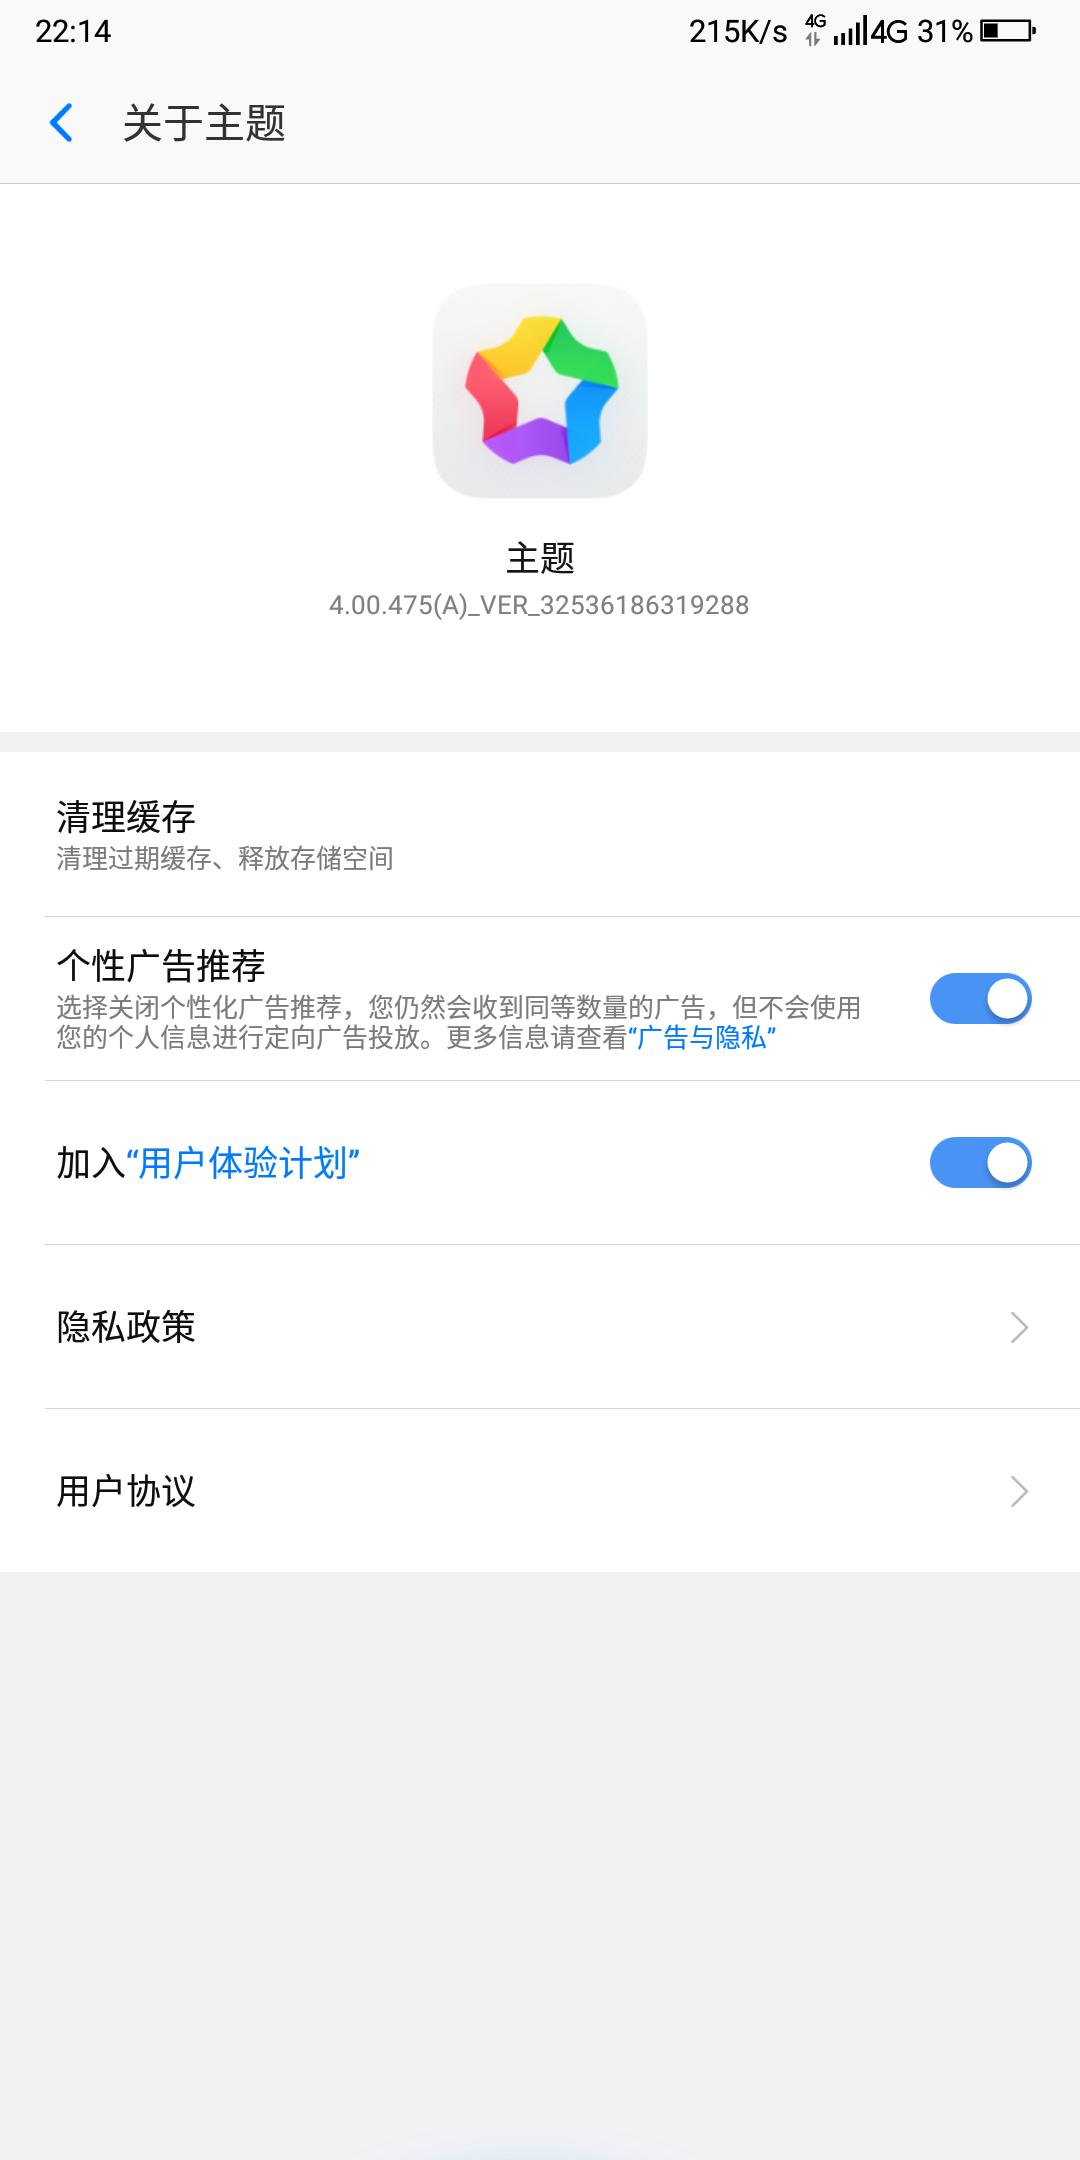 Screenshot_2019-09-18-22-14-03.png